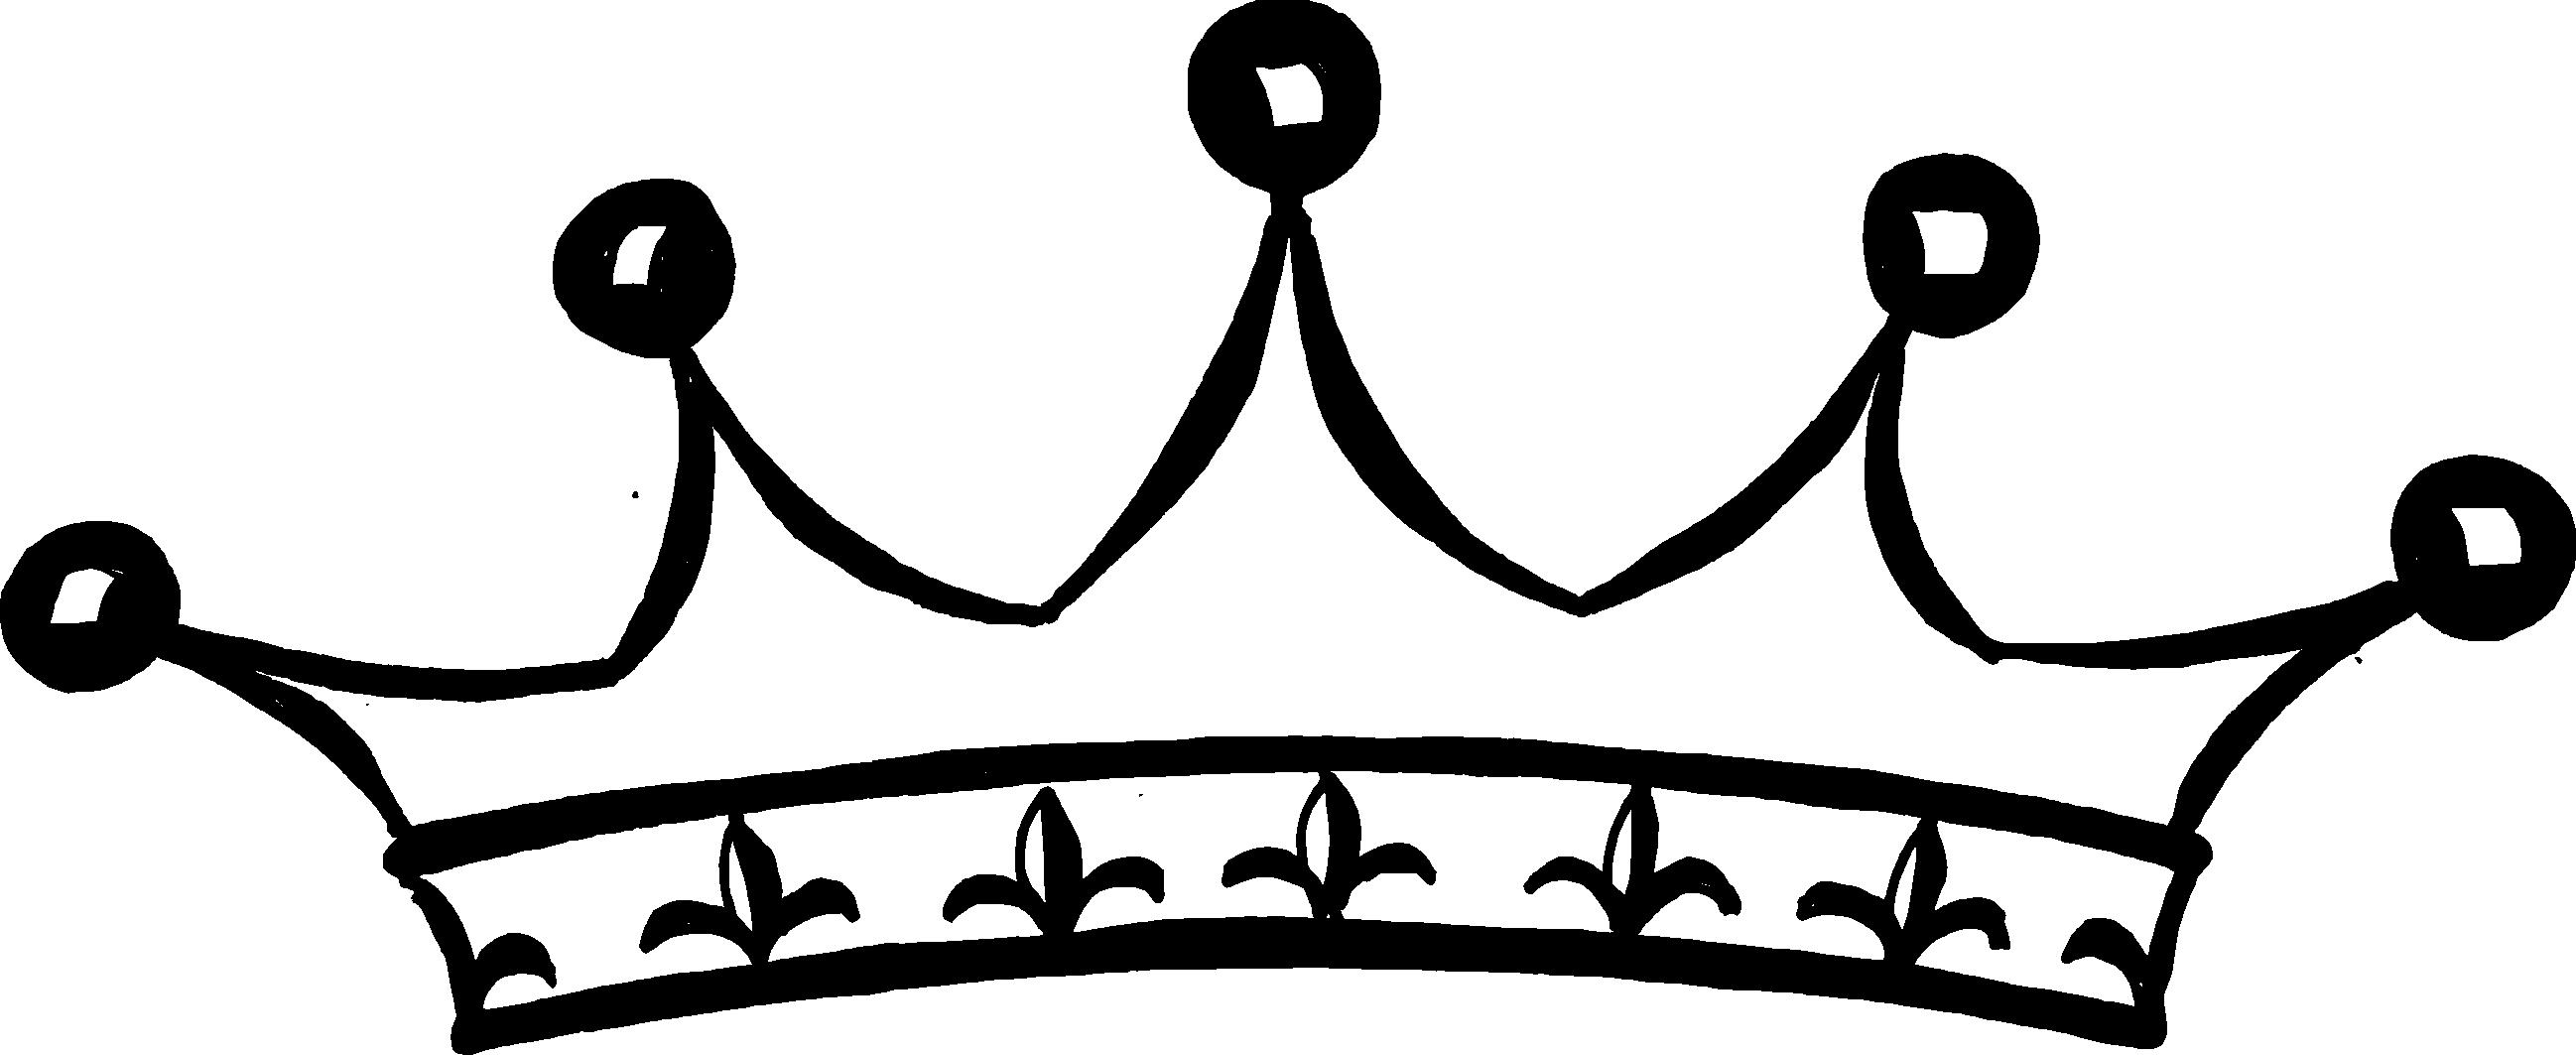 10 black crown png transparent onlygfxcom